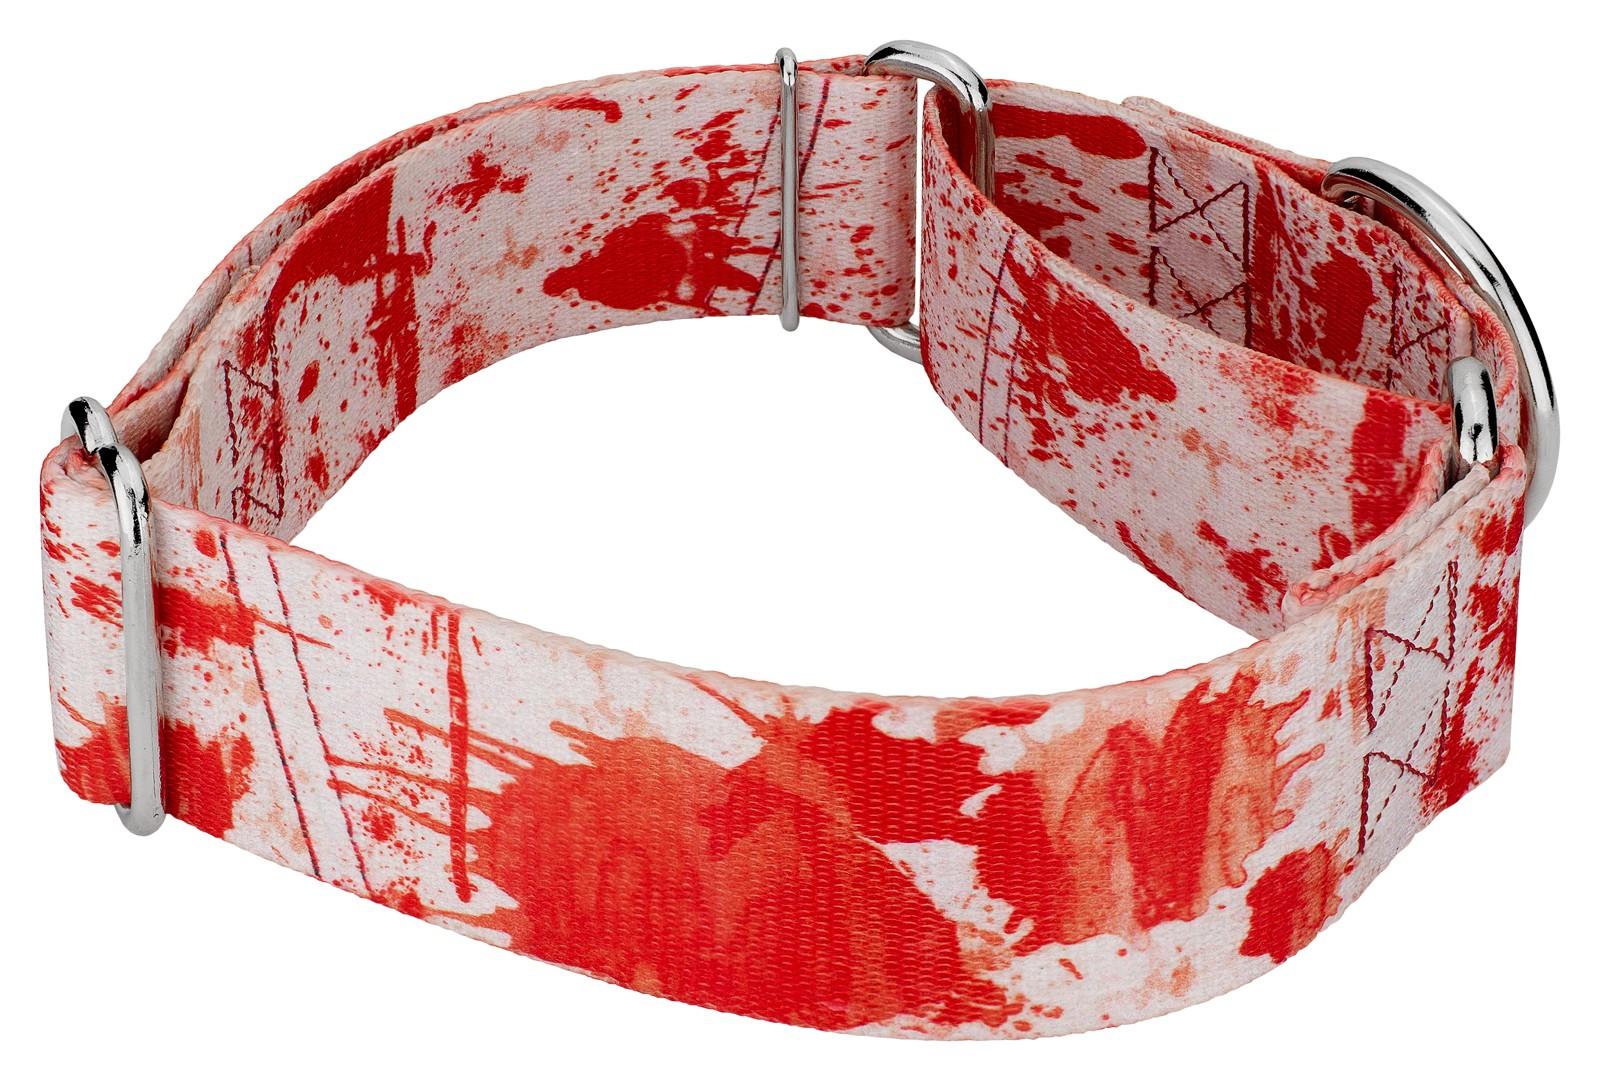 Buy 1 1/2 Inch Blood Spatter Martingale Dog Collar Online